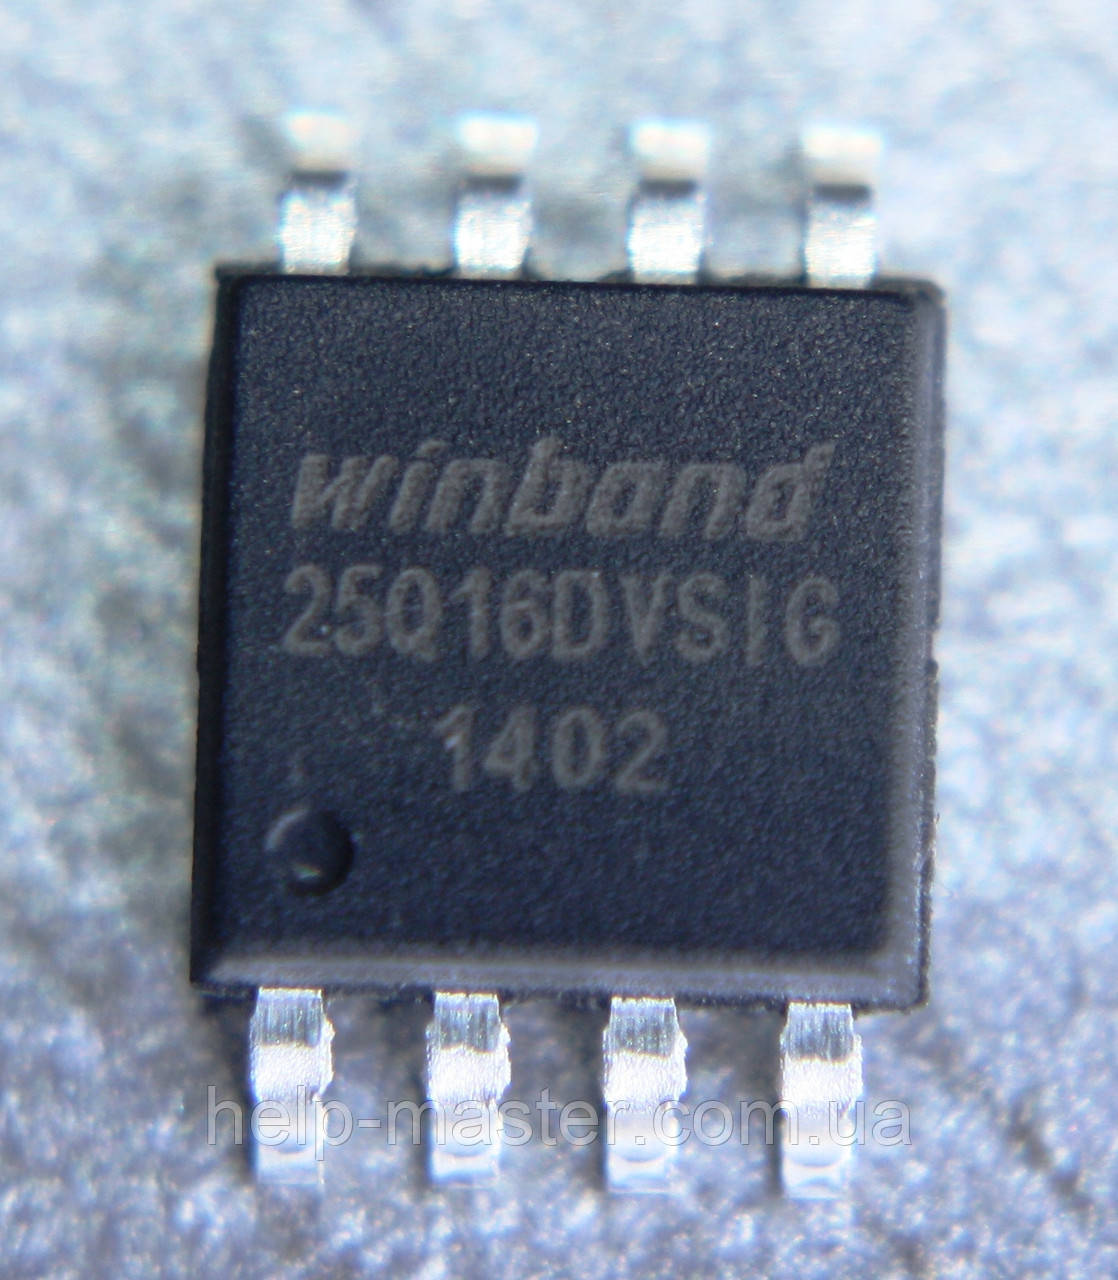 W25Q16DV; (SOP-8)